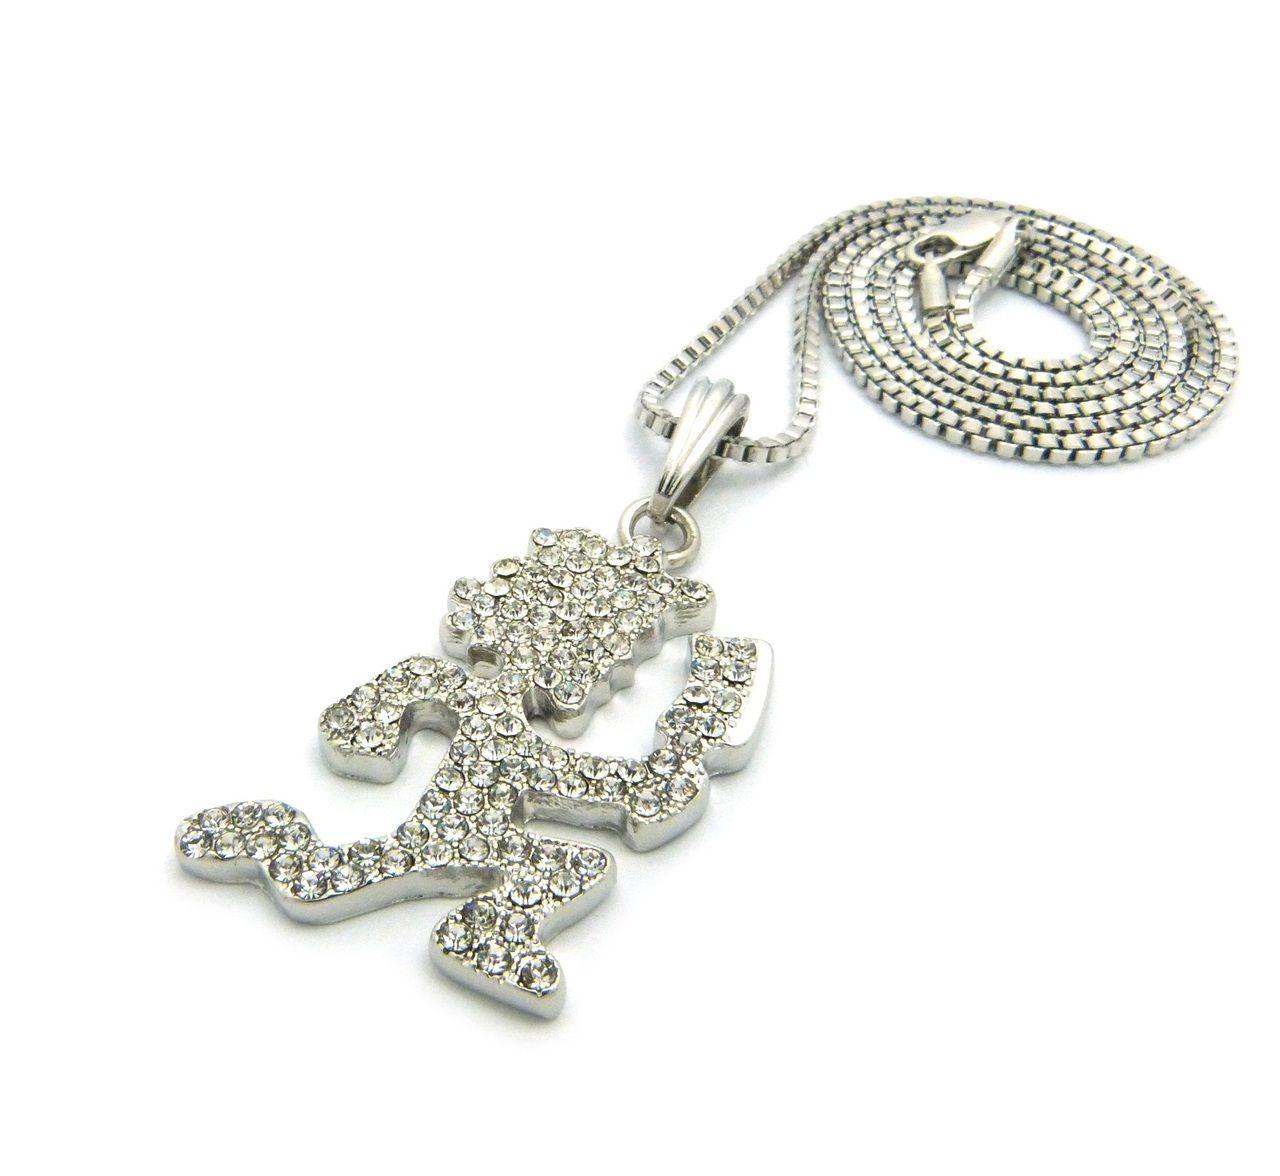 Icp inspired hatchetman hip hop pendant chain silver bling jewelz icp inspired hatchetman hip hop pendant chain silver bling jewelz aloadofball Gallery